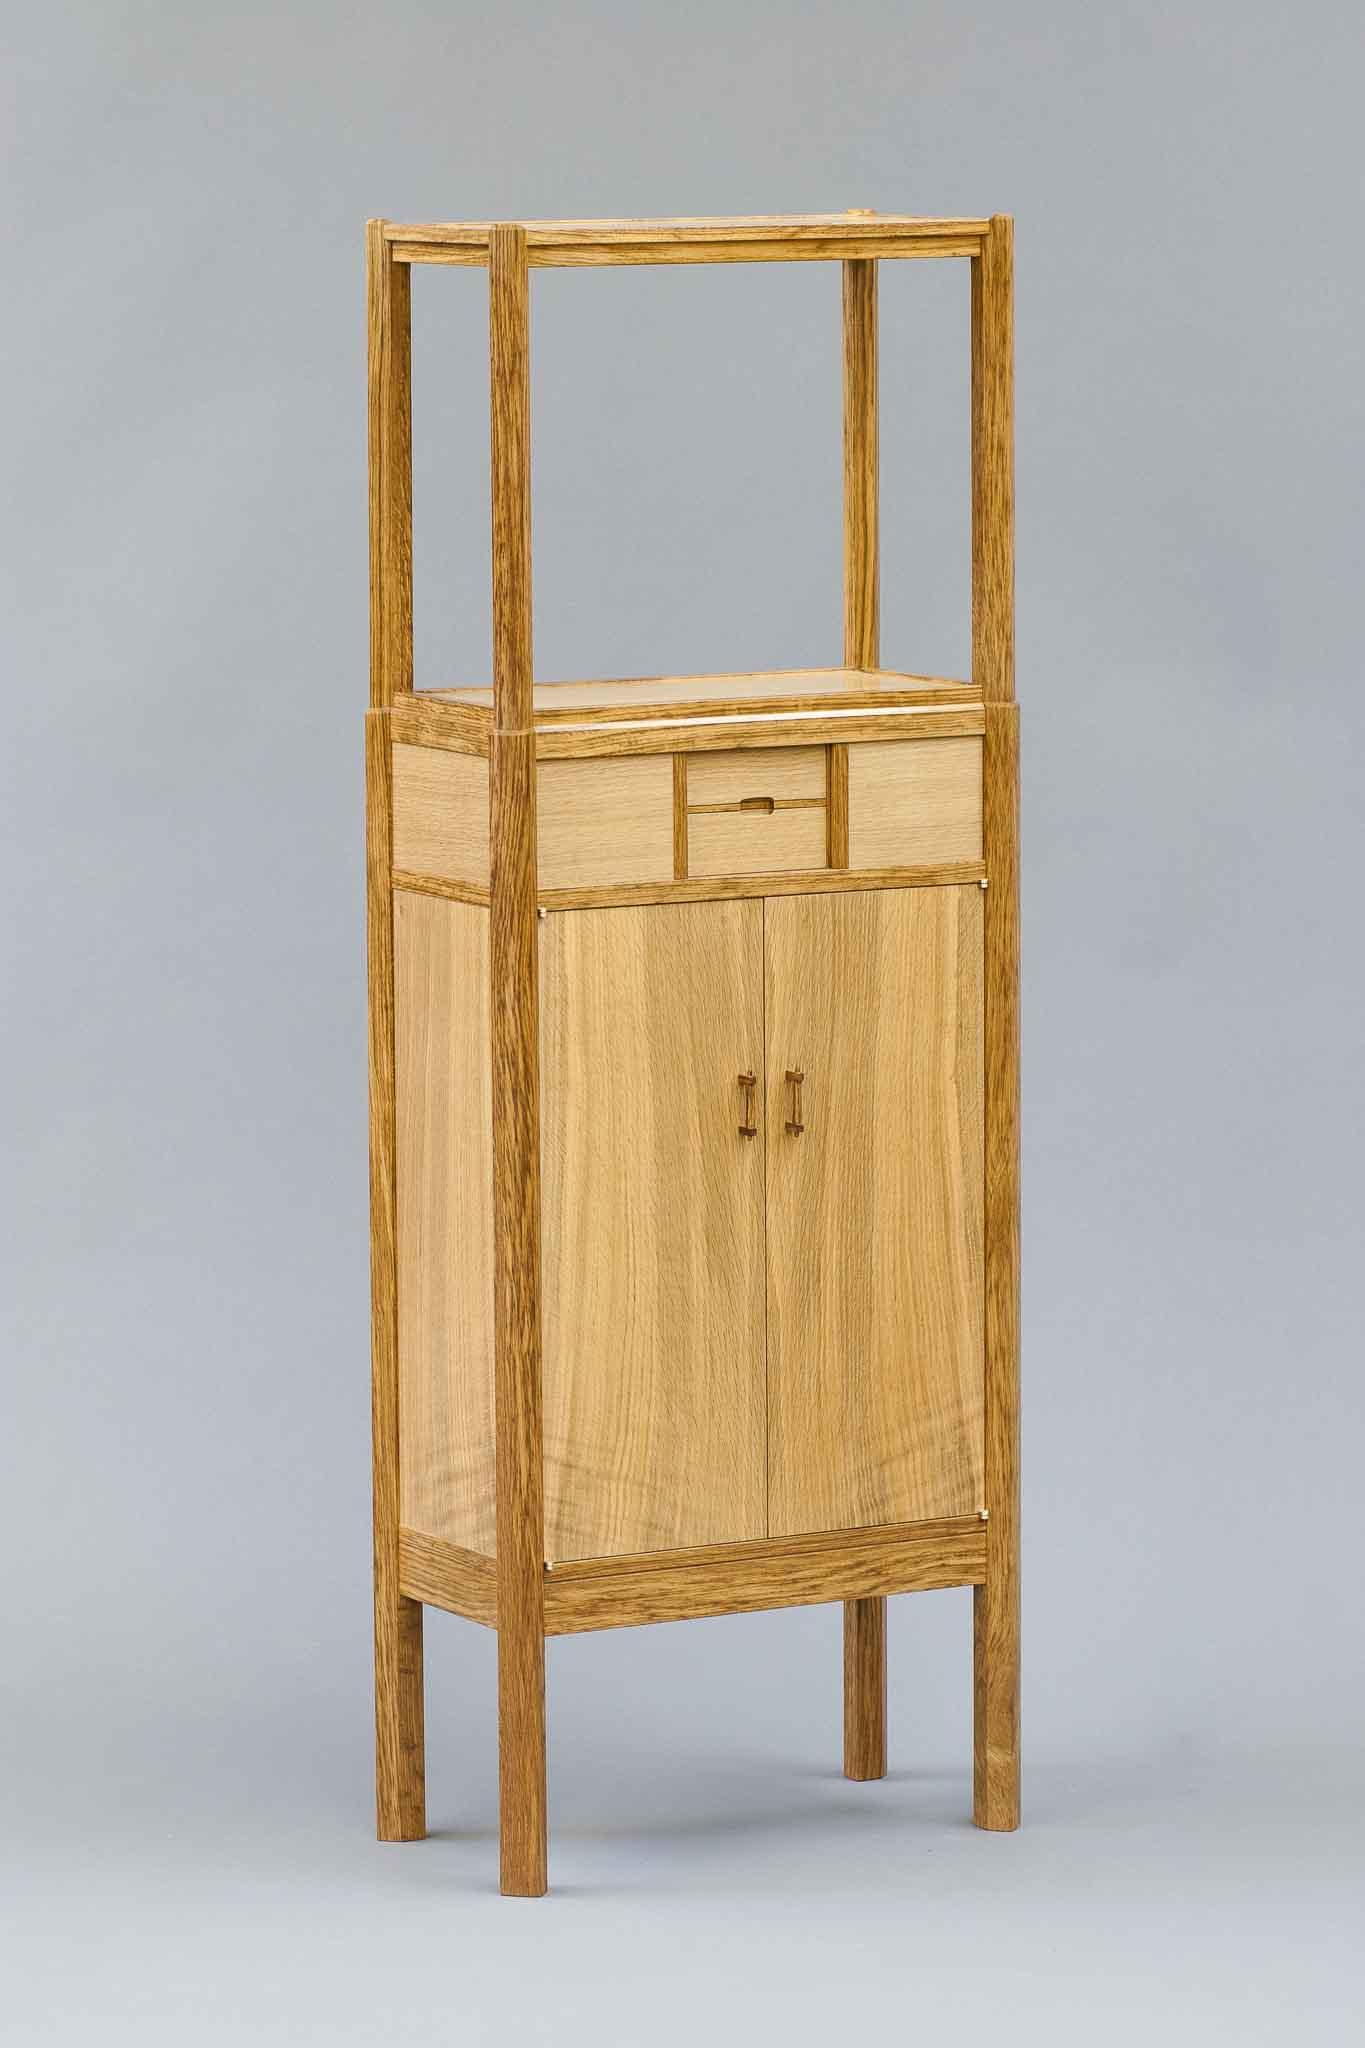 K Cabinet 171 The Krenov School Of Fine Furniture